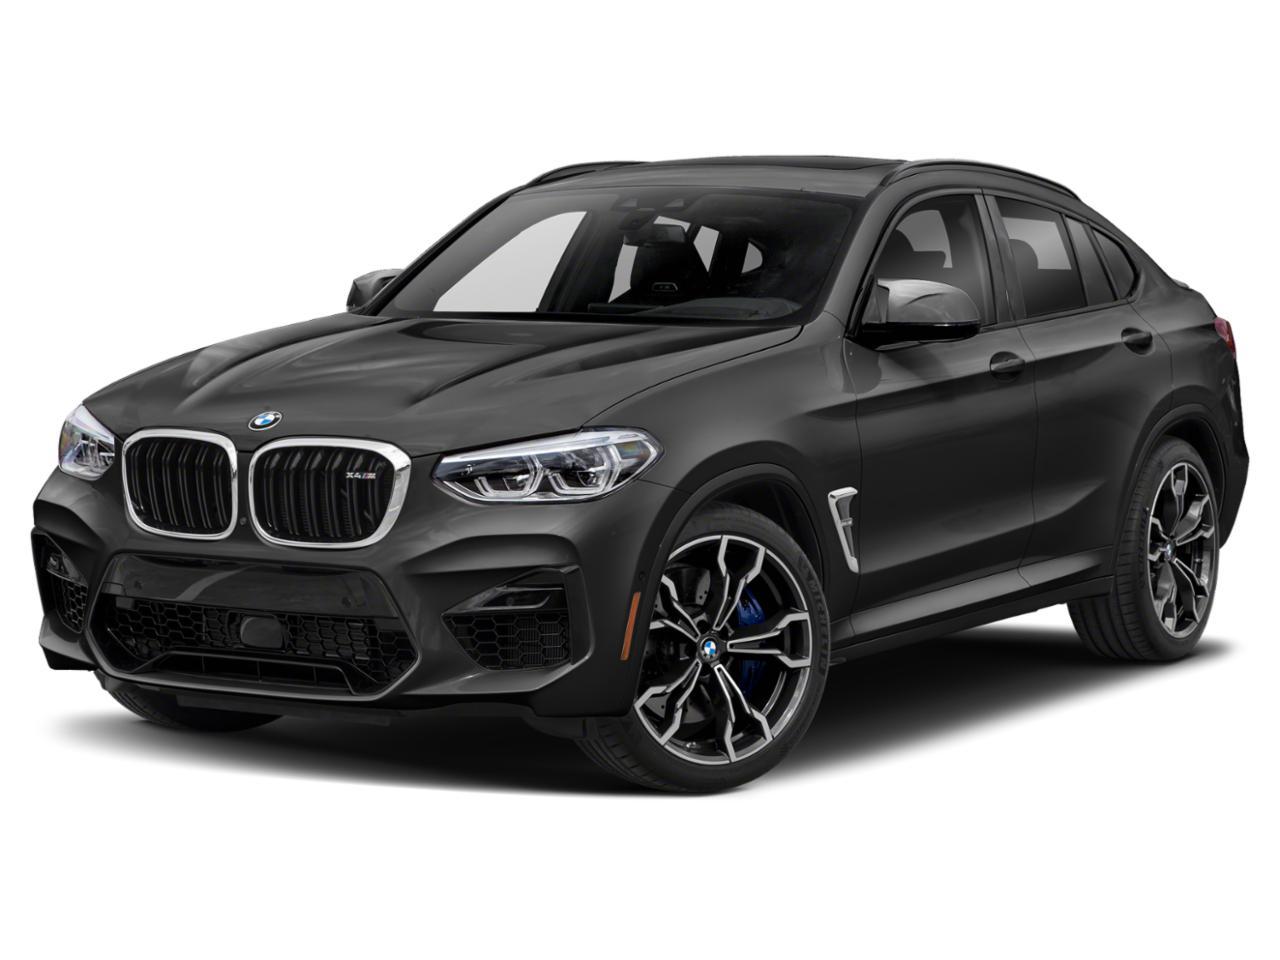 2021 BMW X4 M Vehicle Photo in Grapevine, TX 76051